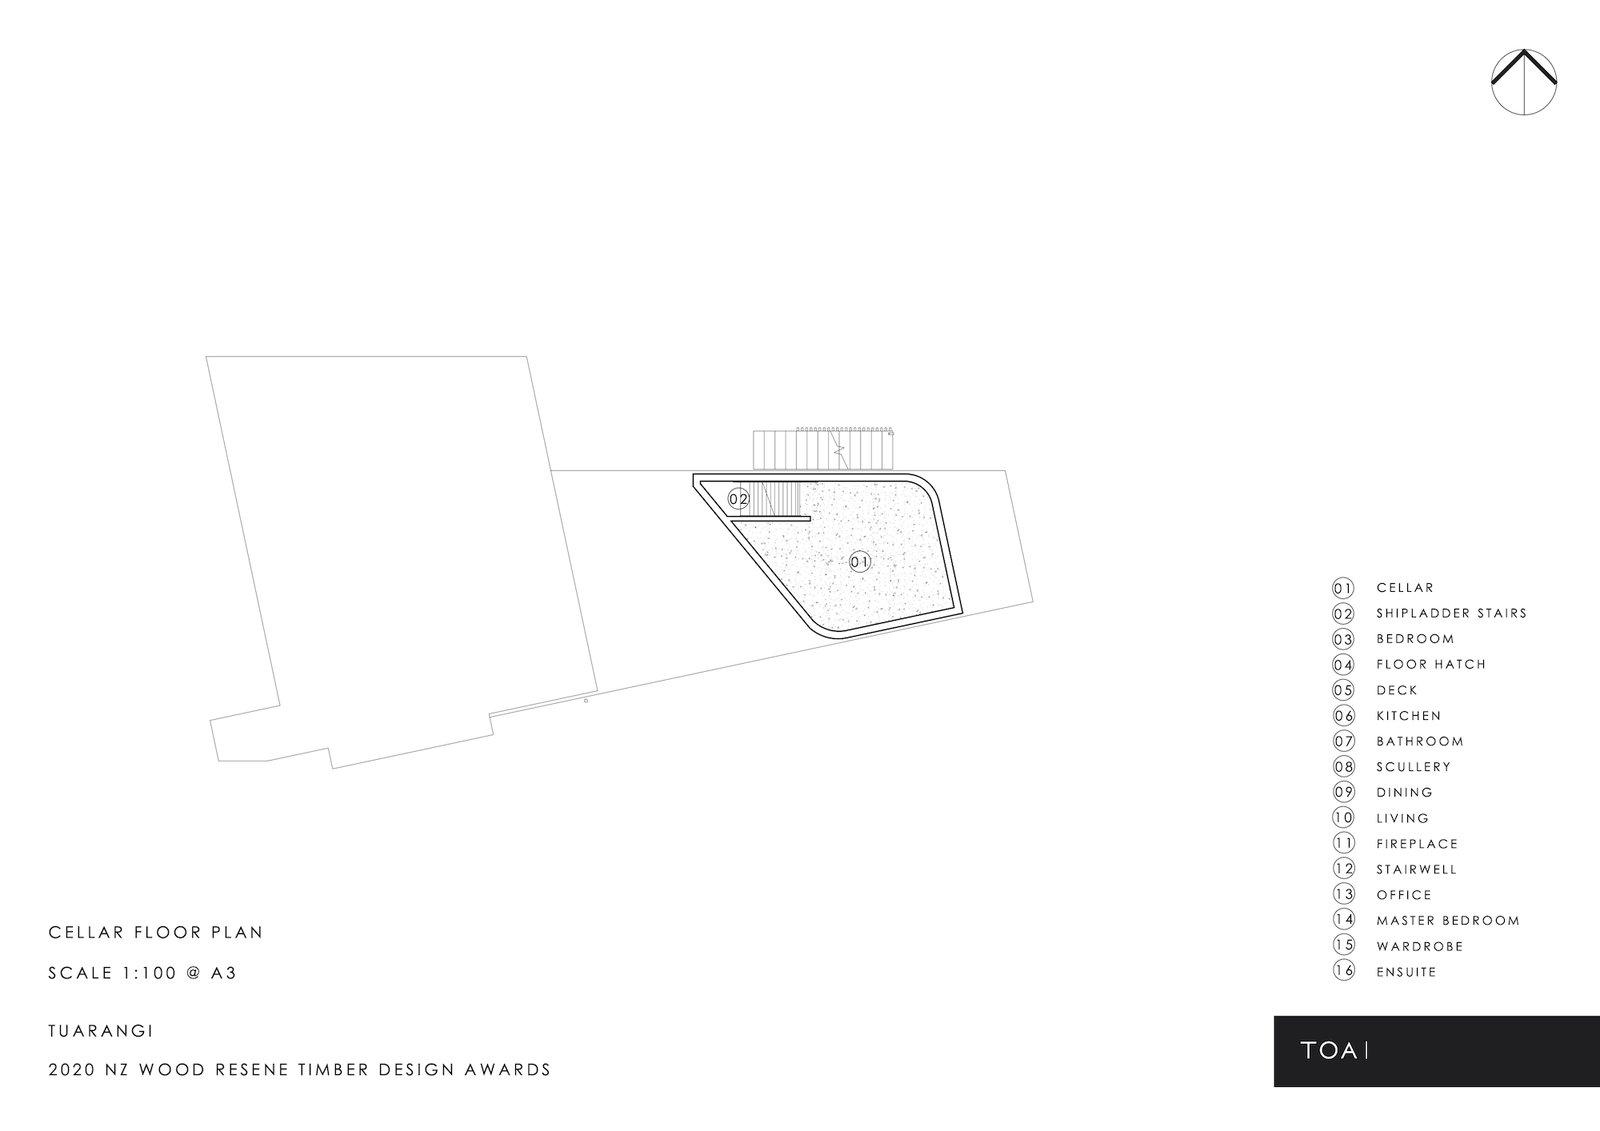 Cellar floor plan of Tuarangi House by TOA Architects.